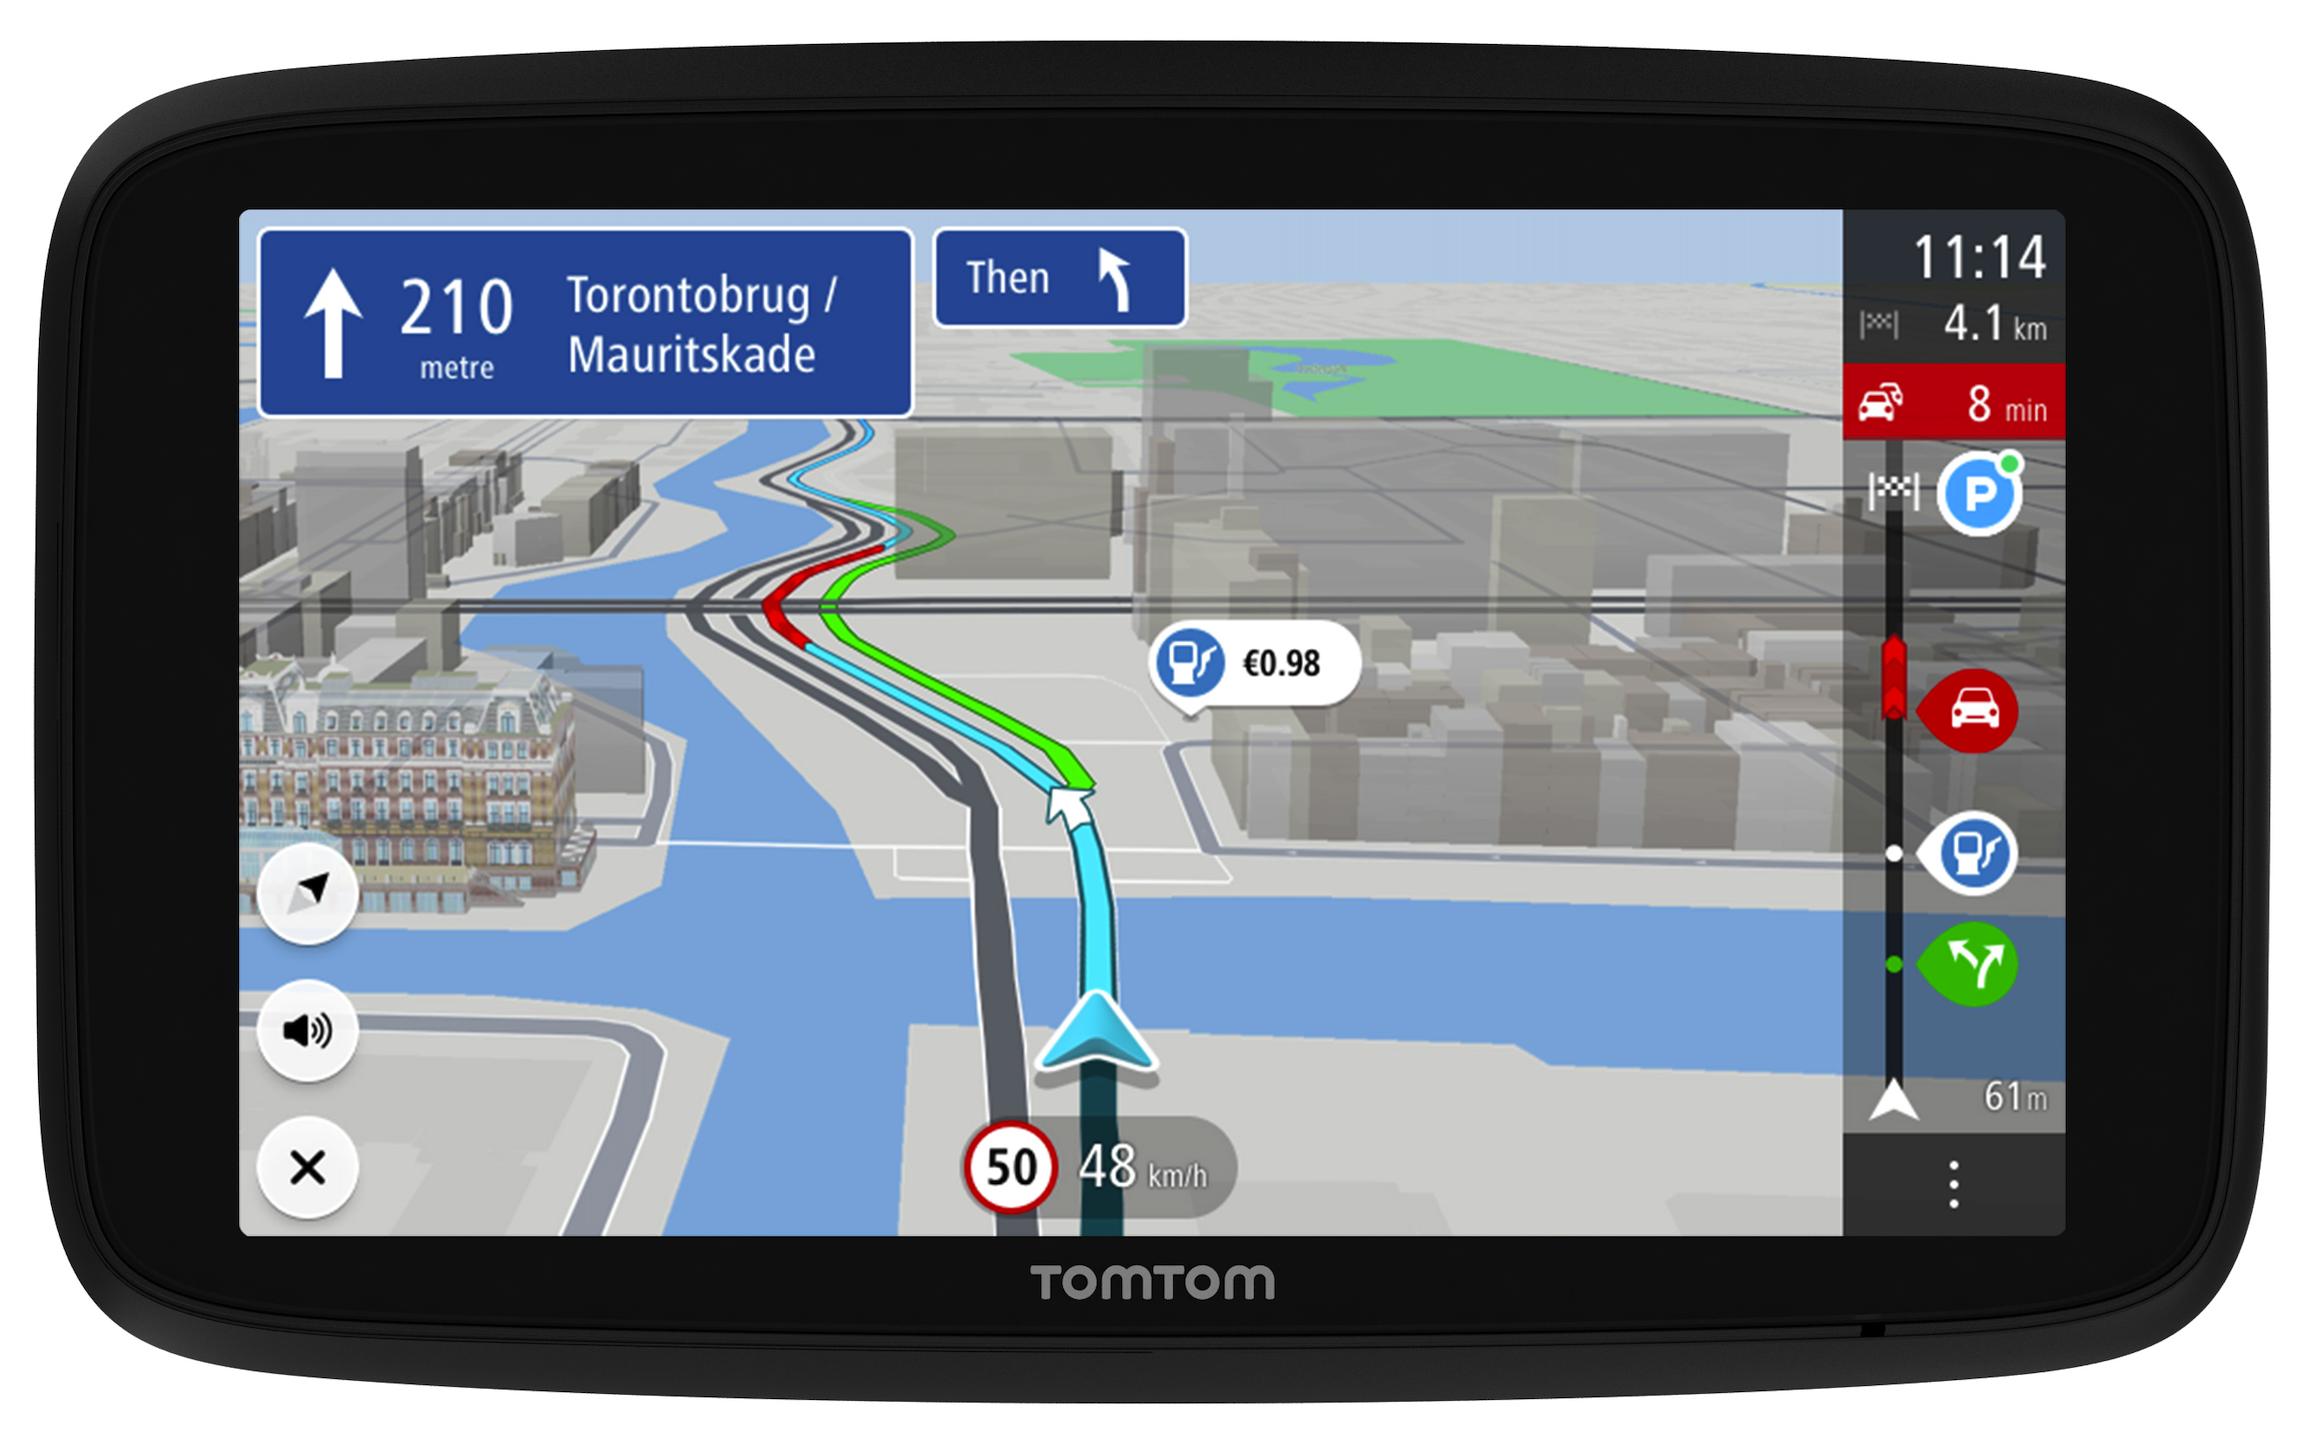 tomtom navigation device